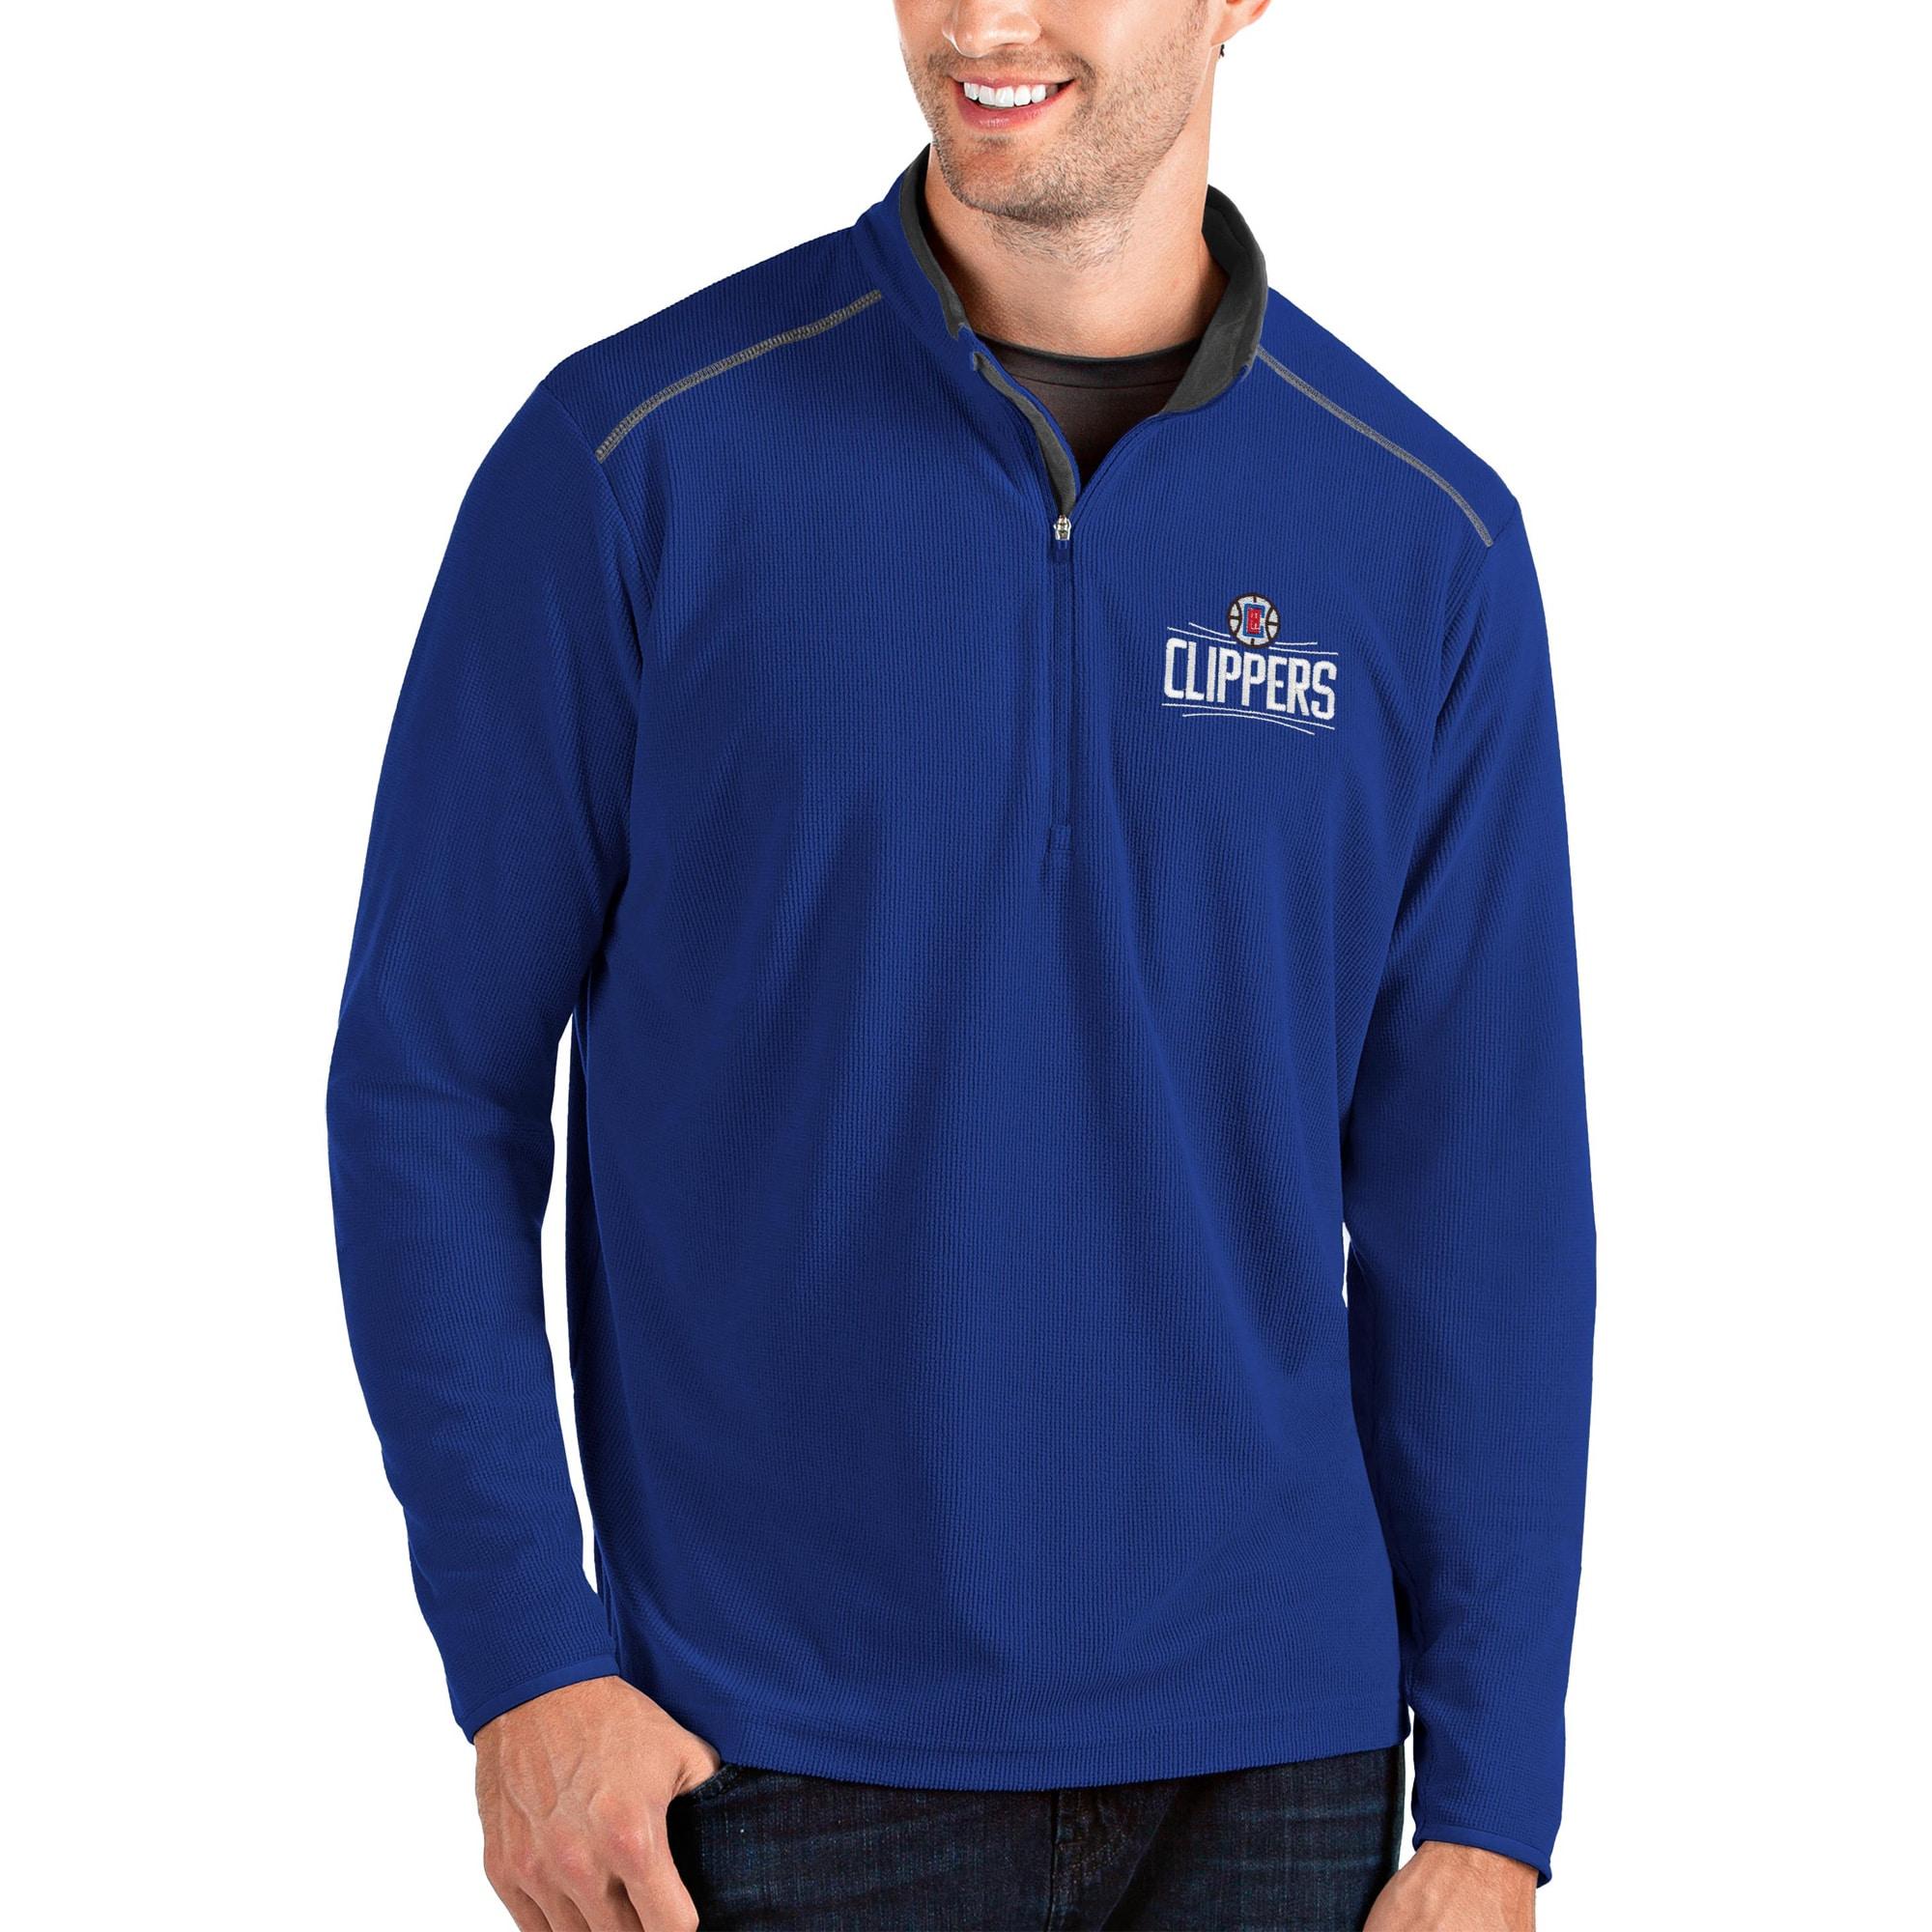 LA Clippers Antigua Glacier Quarter-Zip Pullover Jacket - Royal/Gray